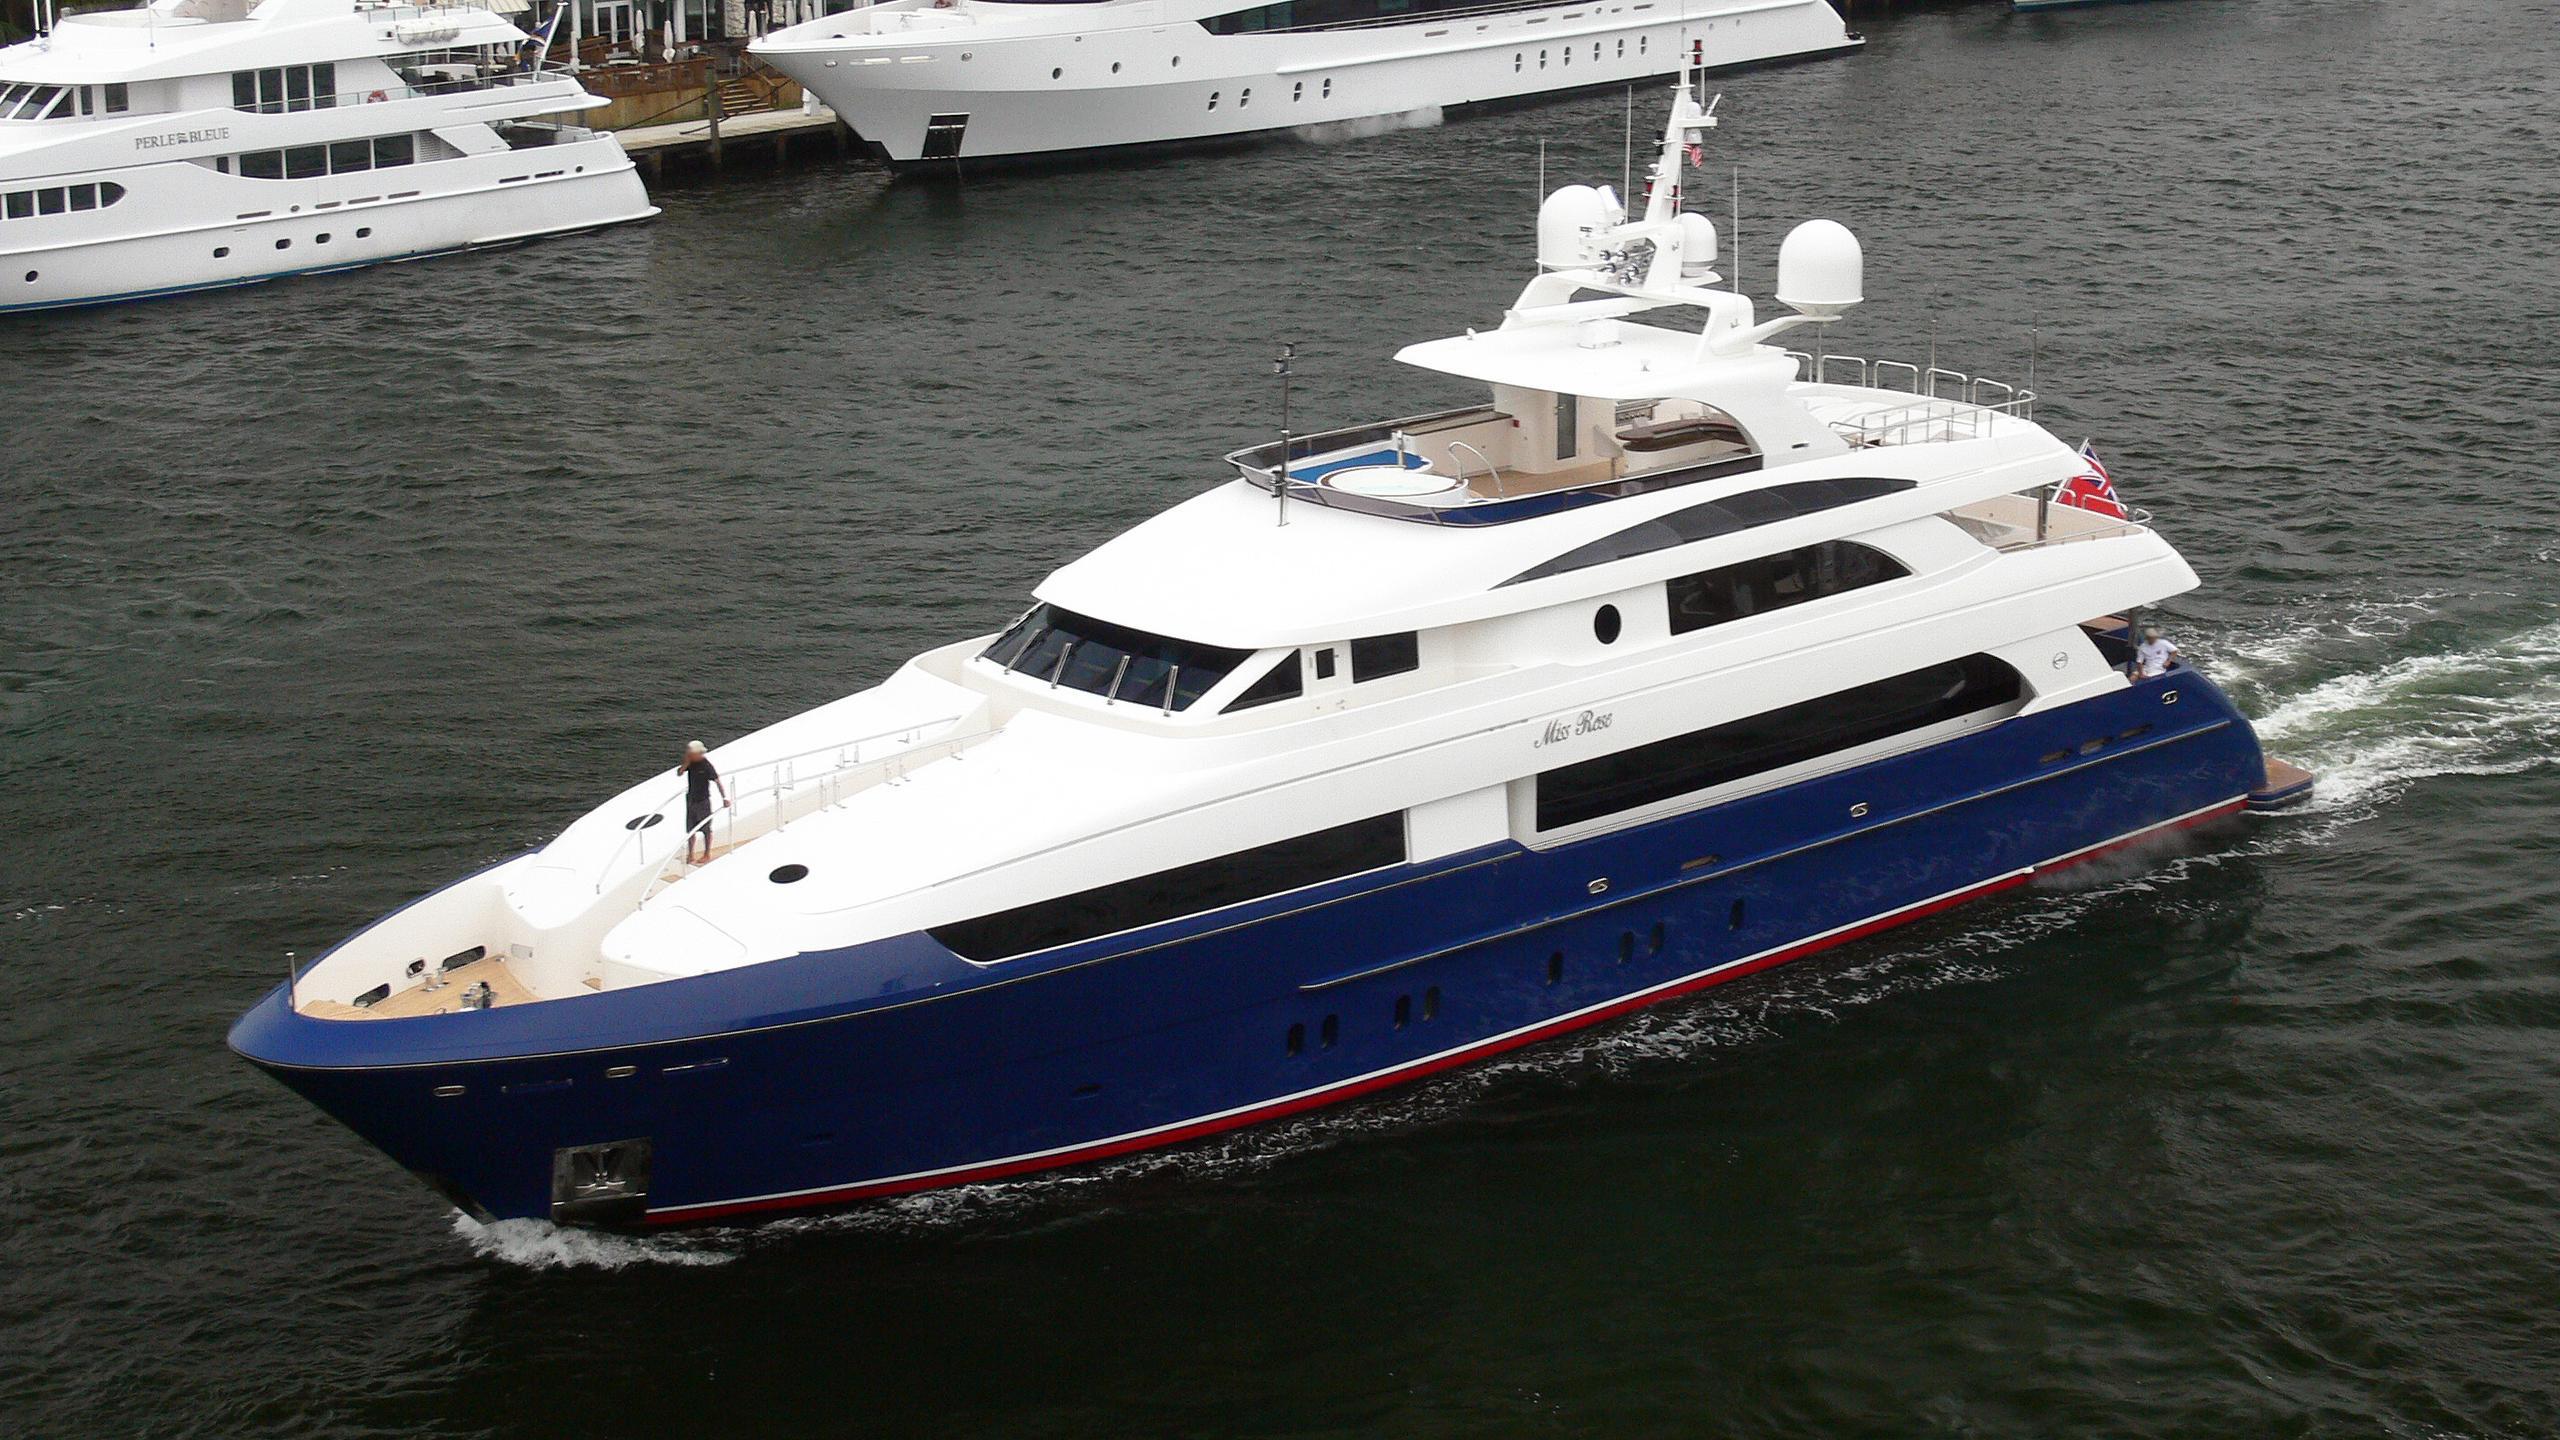 lady-leila-motor-yacht-horizon-premier-130-2008-40m-running-half-profile